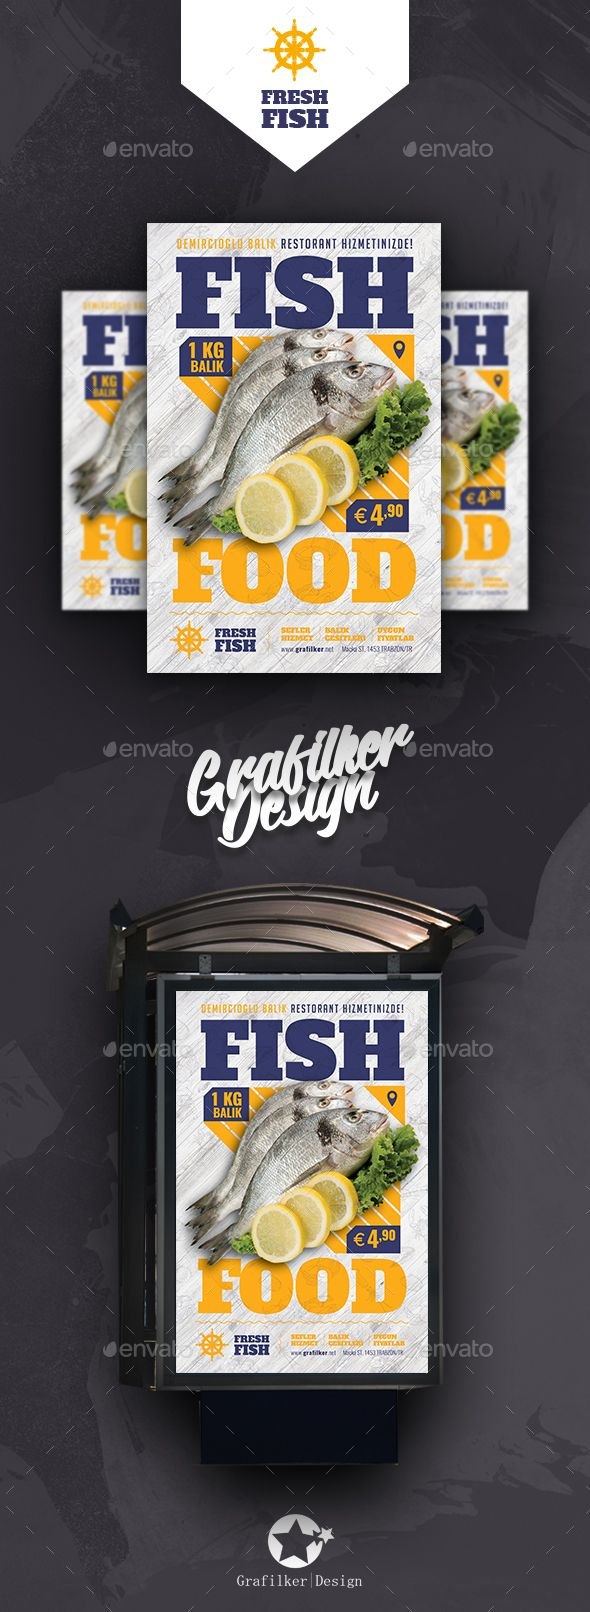 Sea Food Restaurant Poster Templates #flyer #summer • Download ➝ https://graphicriver.net/item/sea-food-restaurant-poster-templates/21318326?ref=pxcr